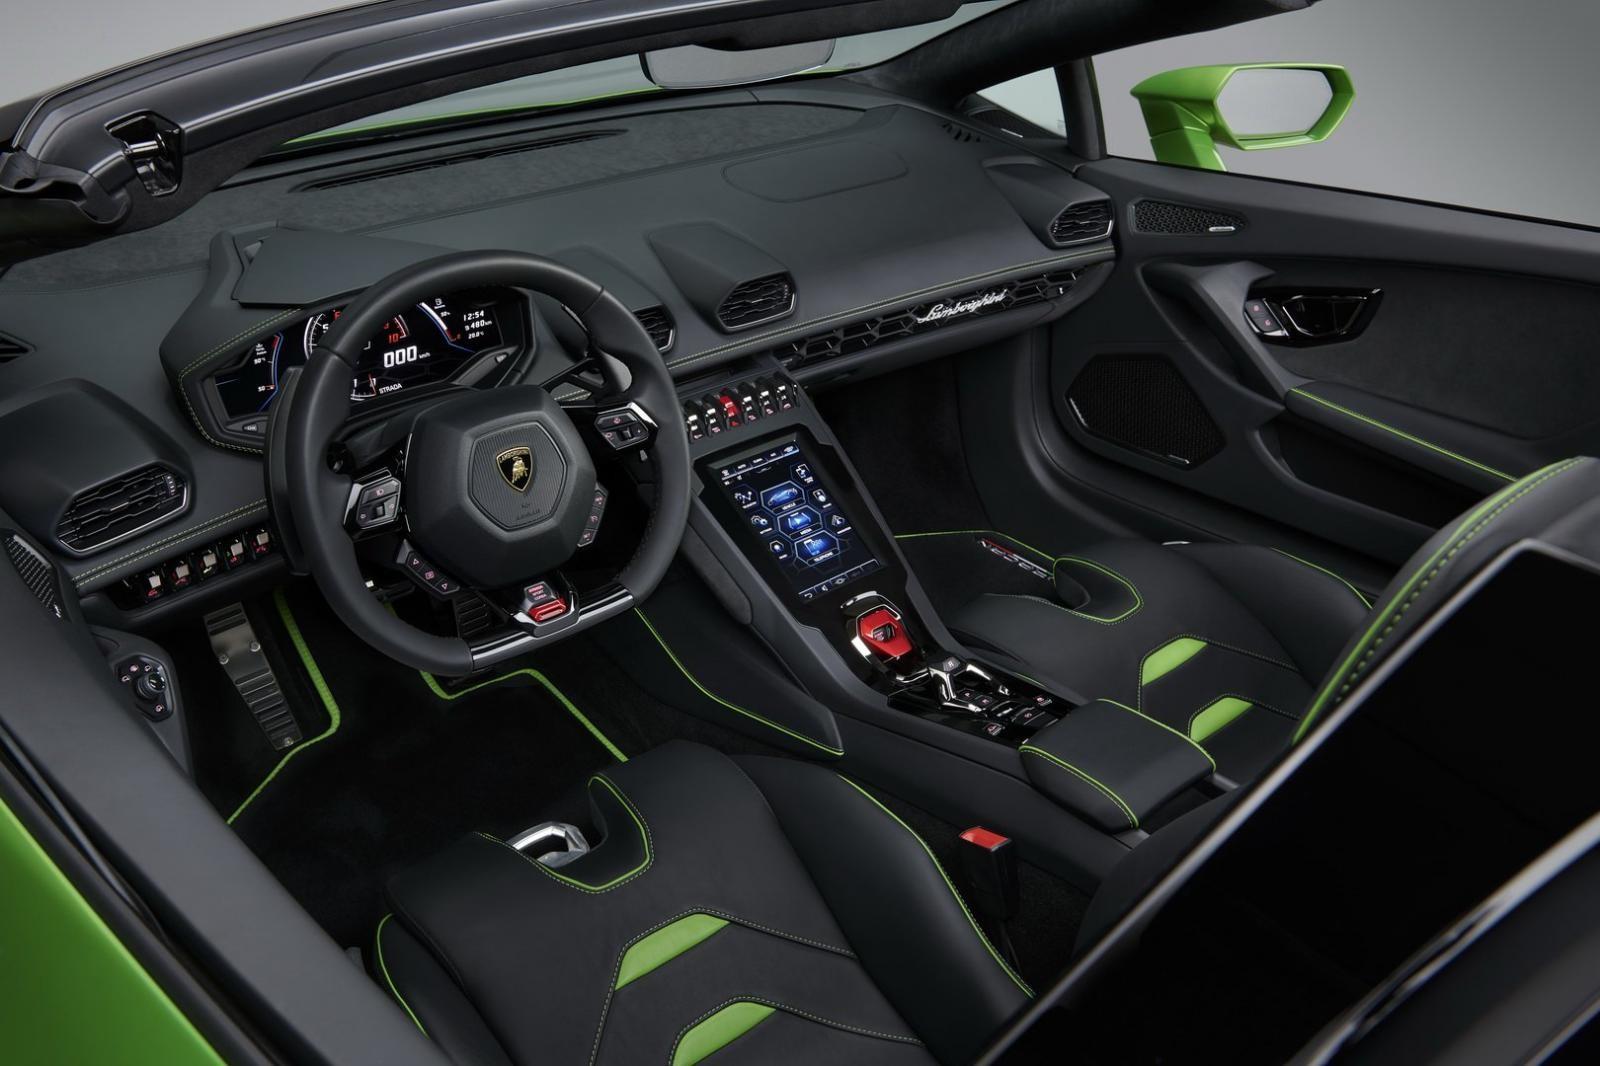 Nội thất của Lamborghini Huracan Evo Spyder